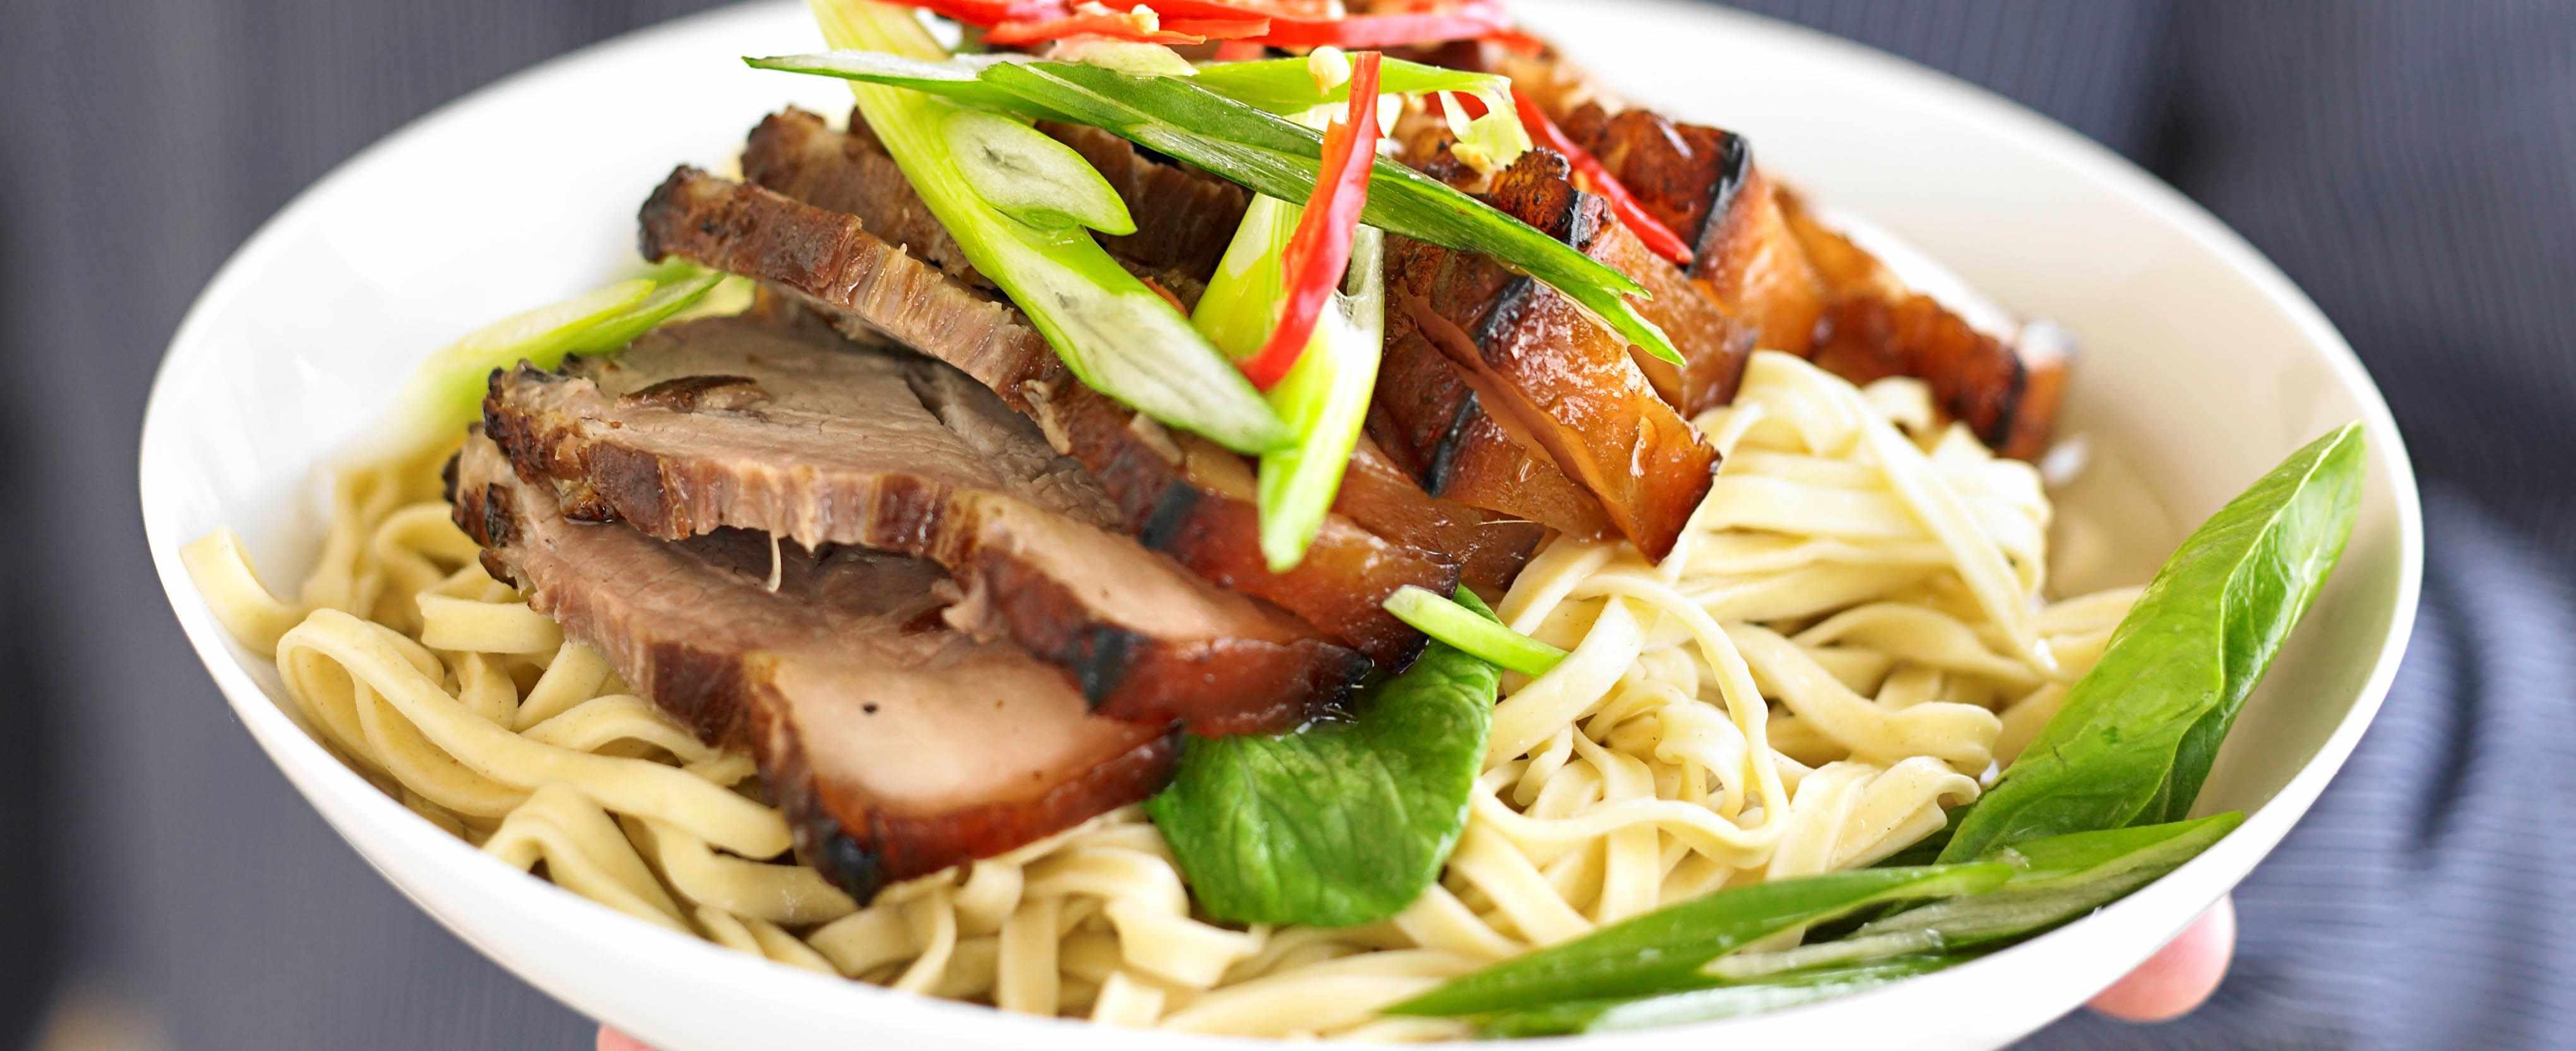 Red Braised Pork Recipe Chinese-Style